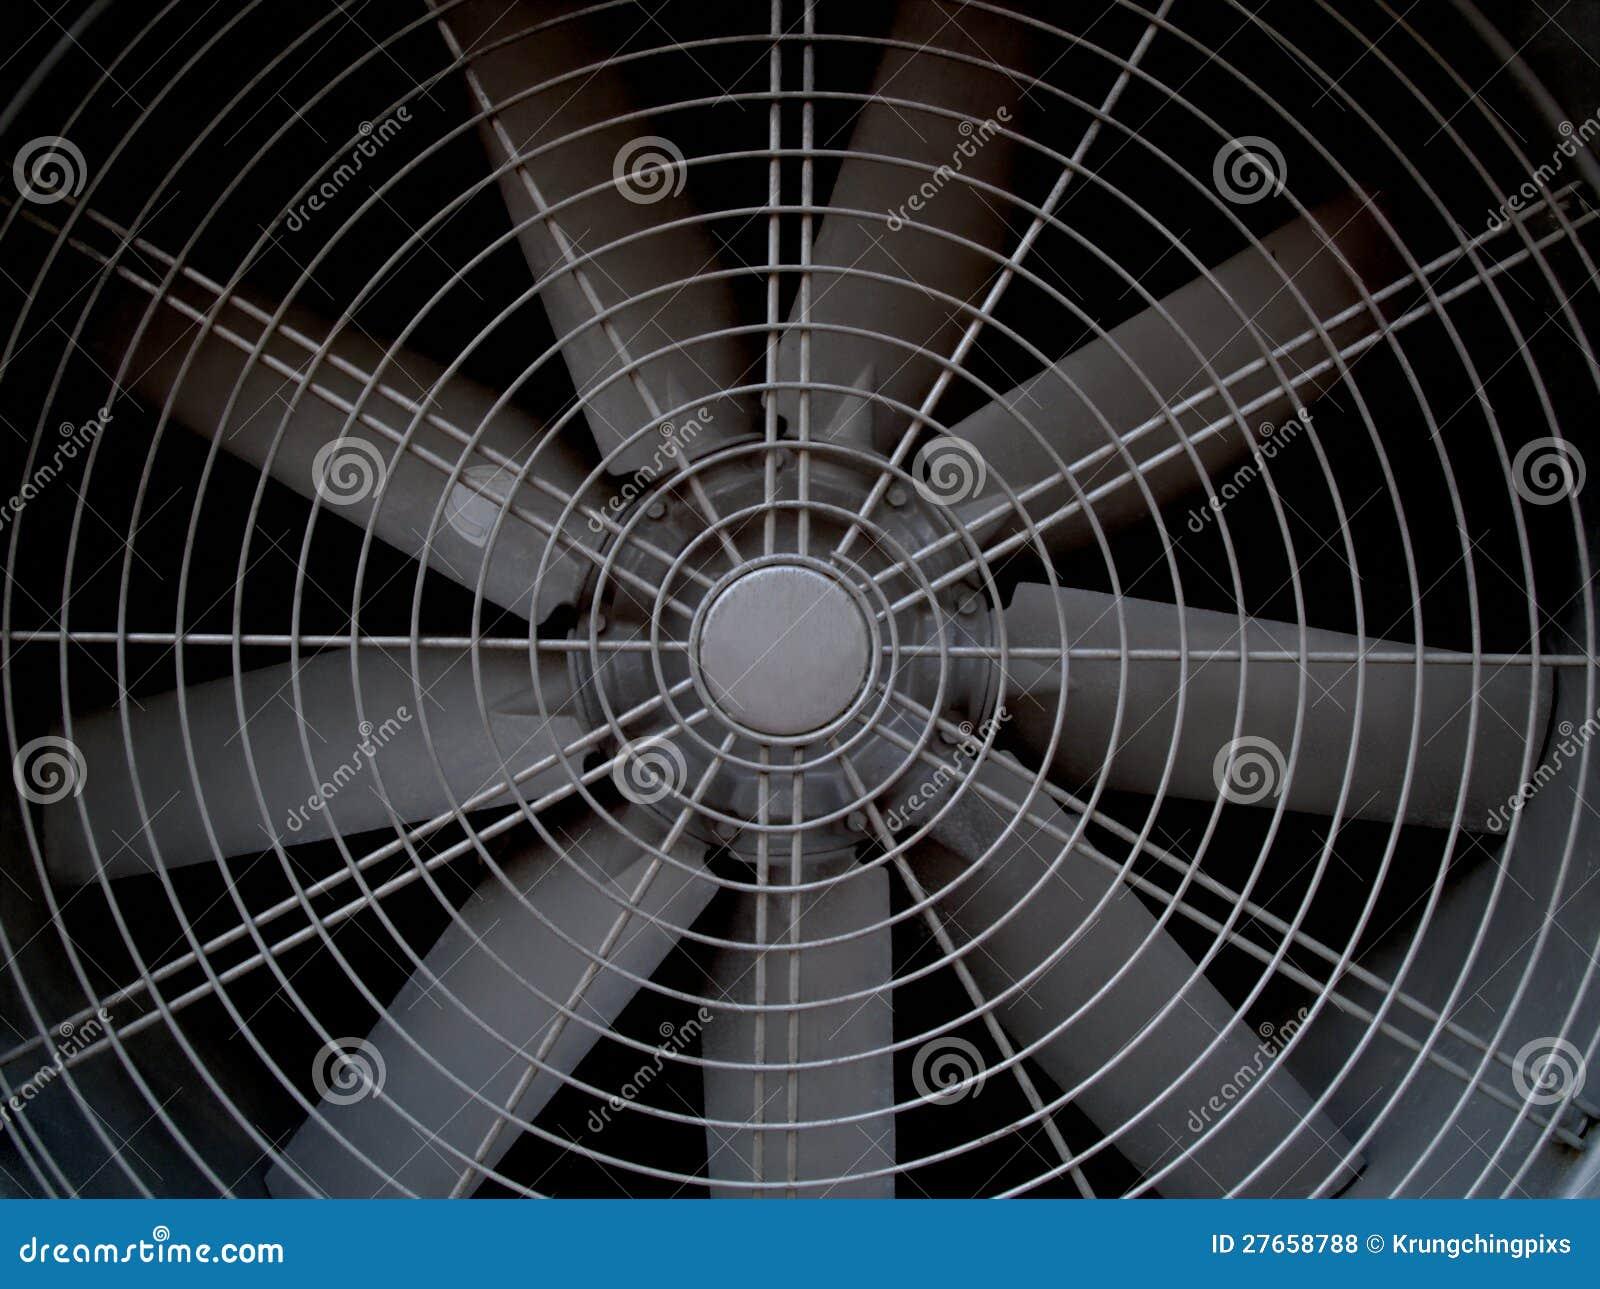 Grand Ventilateur Industriel s libres de droits